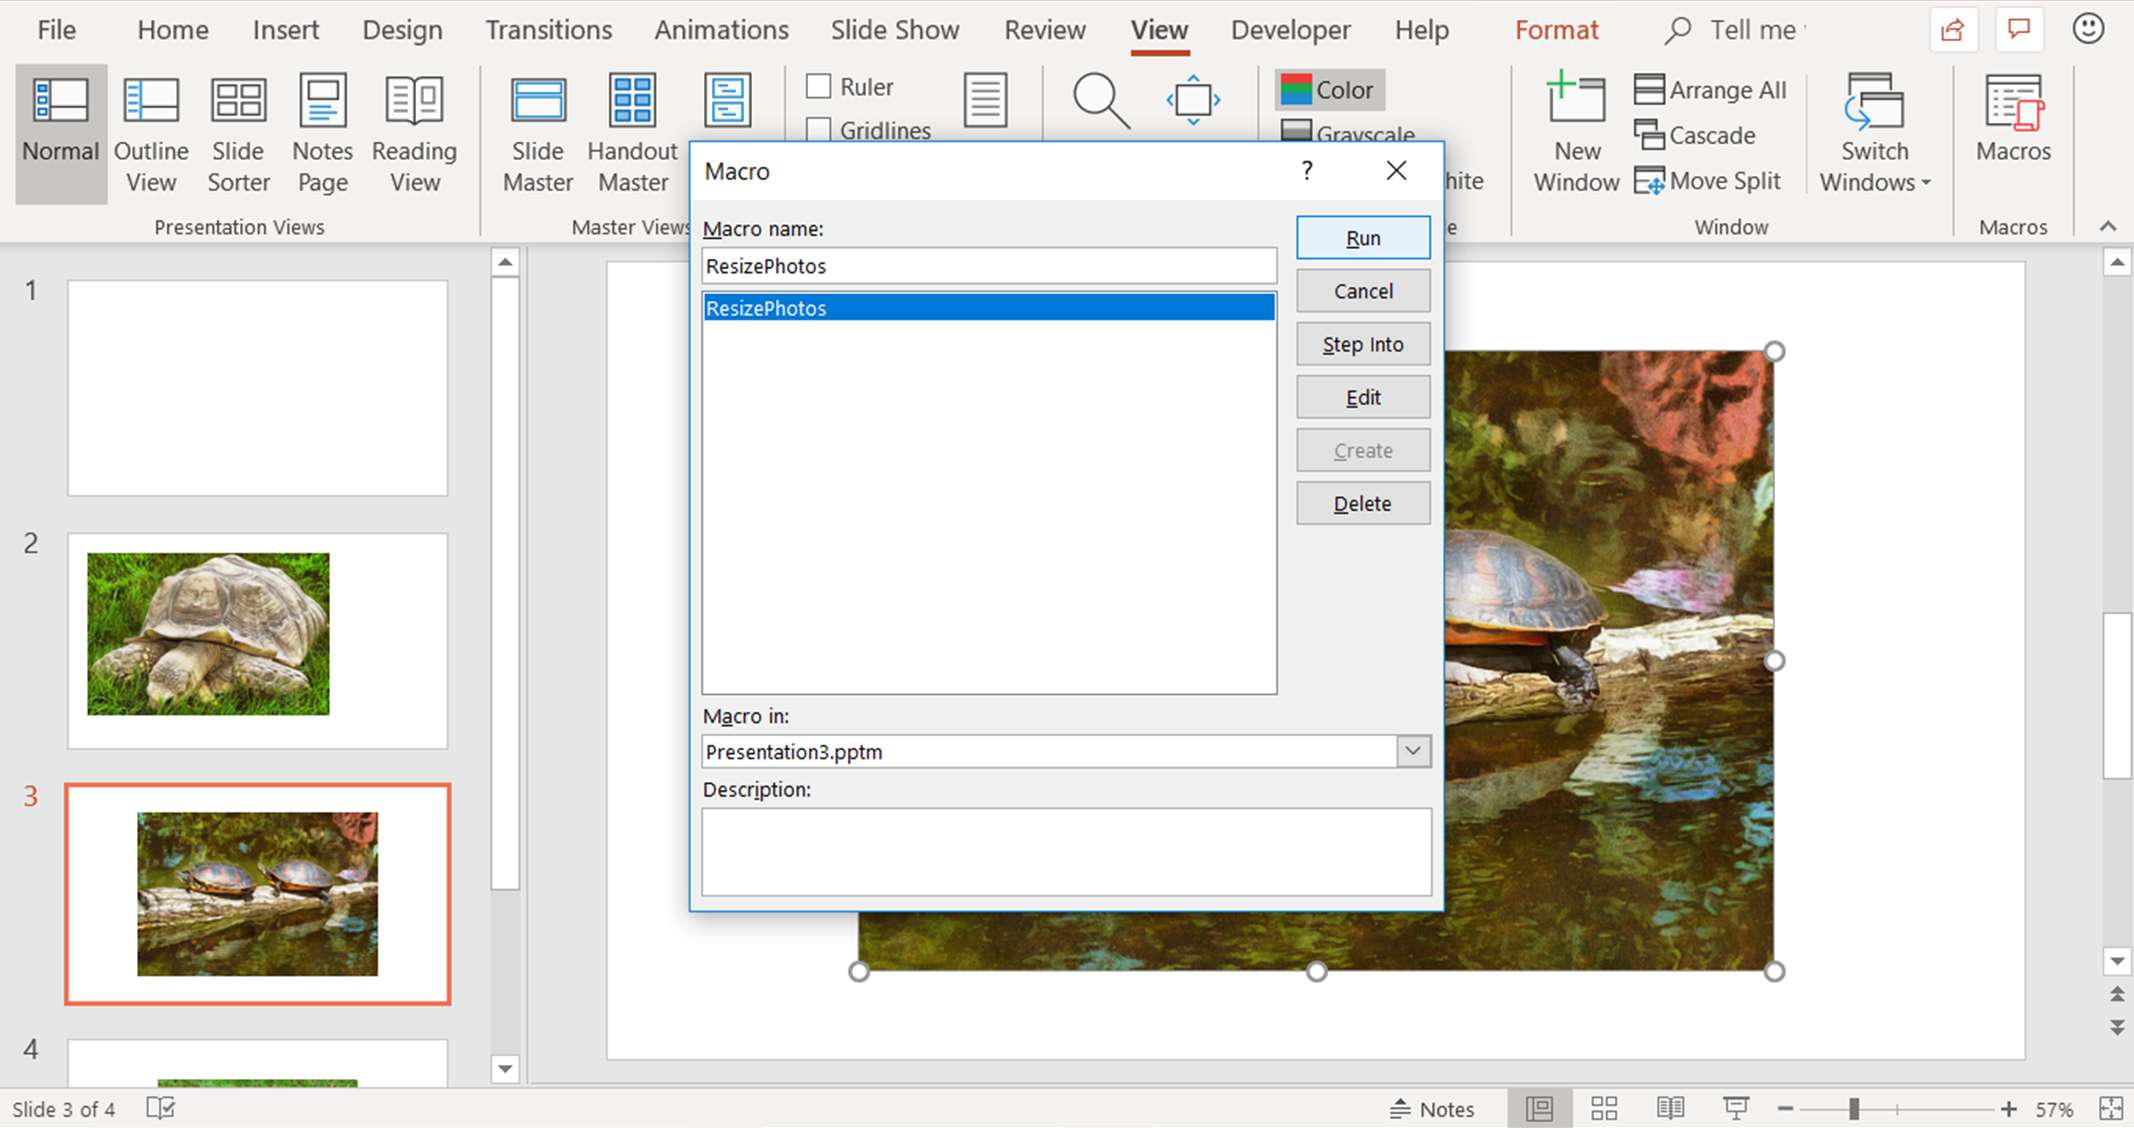 A screenshot showing how to run a macro in PowerPoint